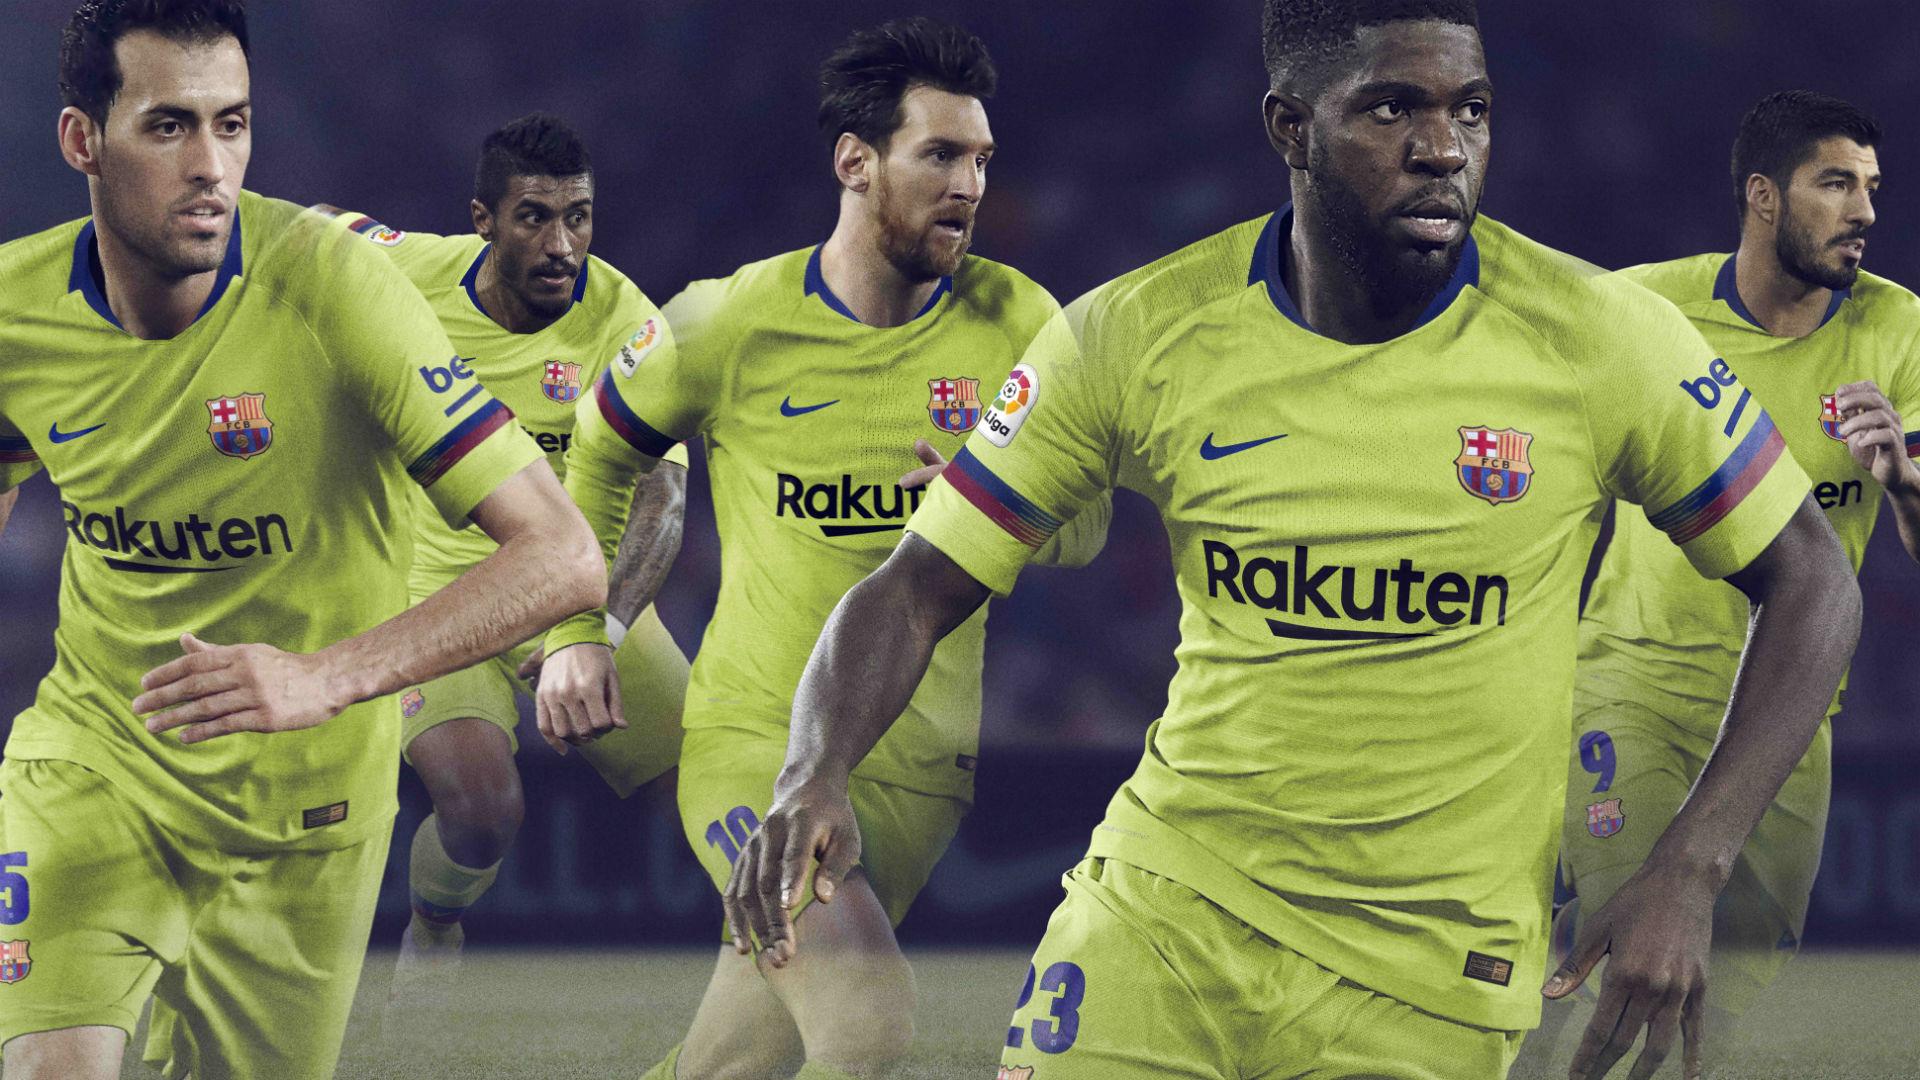 Barcelona 2018-19 away kit